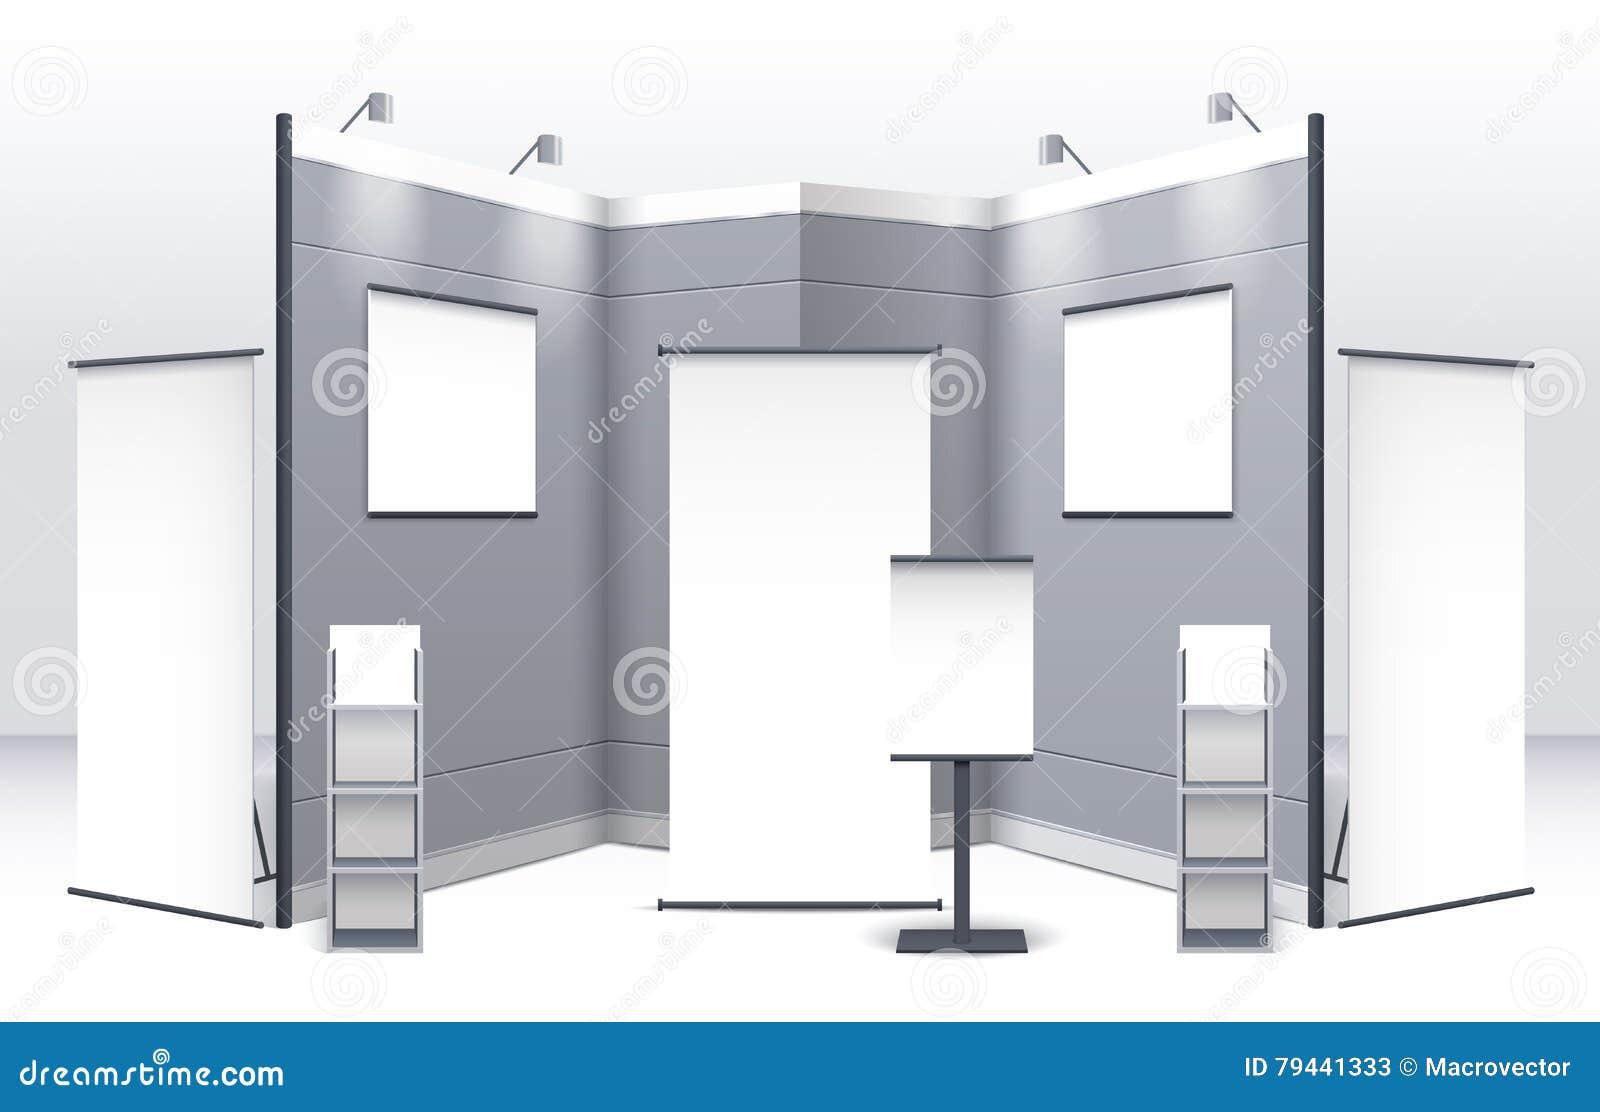 Exhibition Stand Template : Exhibition stand template royalty free illustration